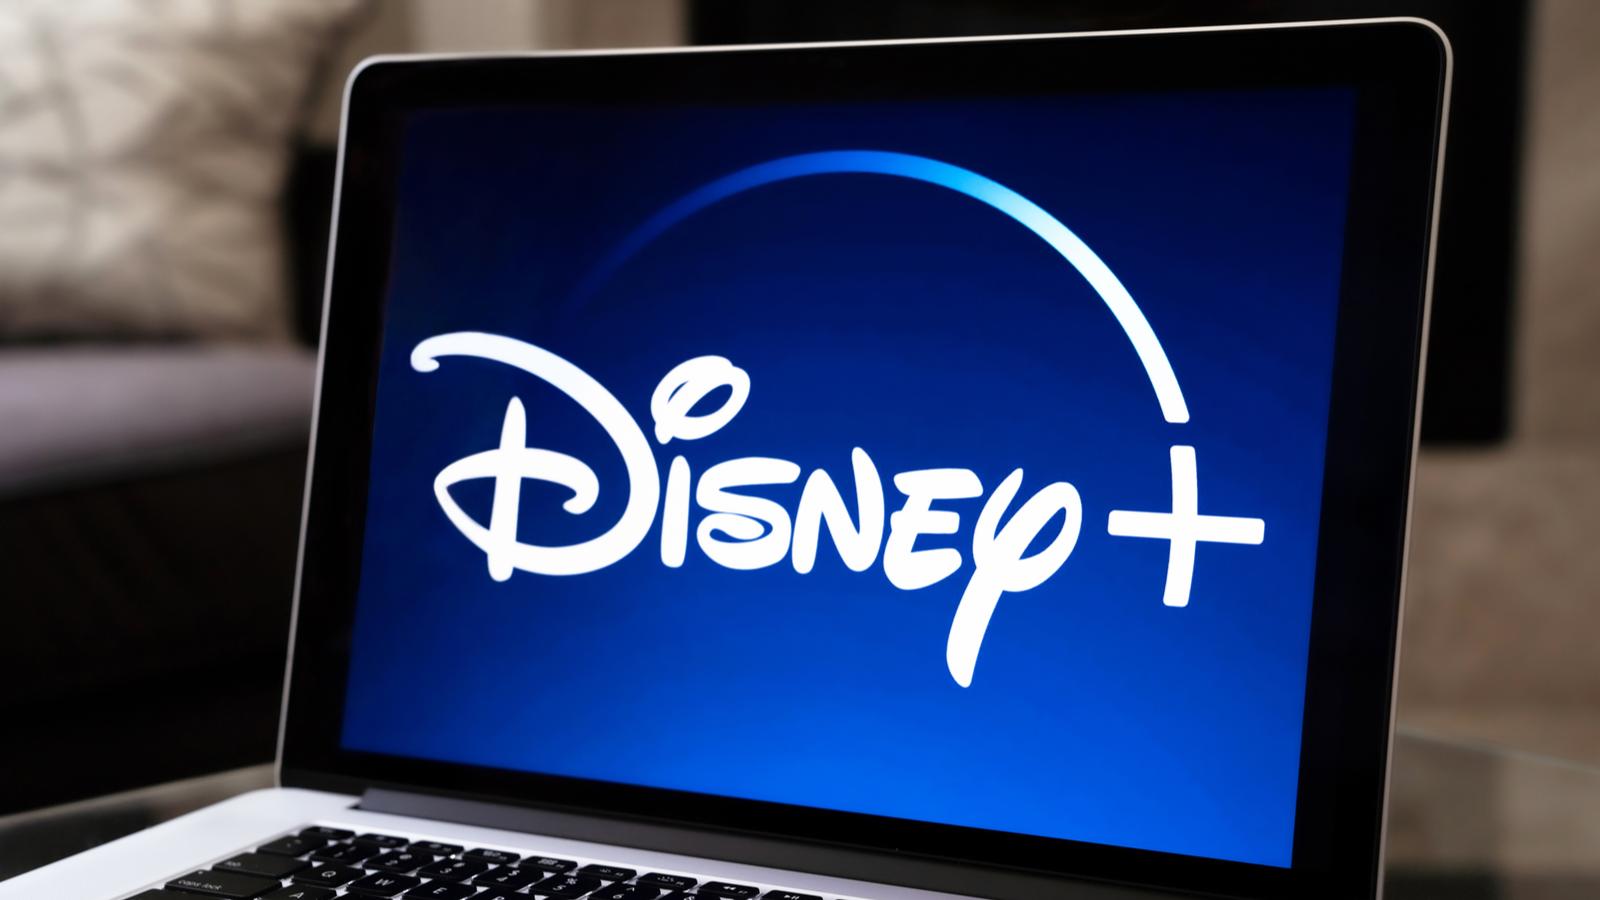 Disney Plus on a MacBook screen